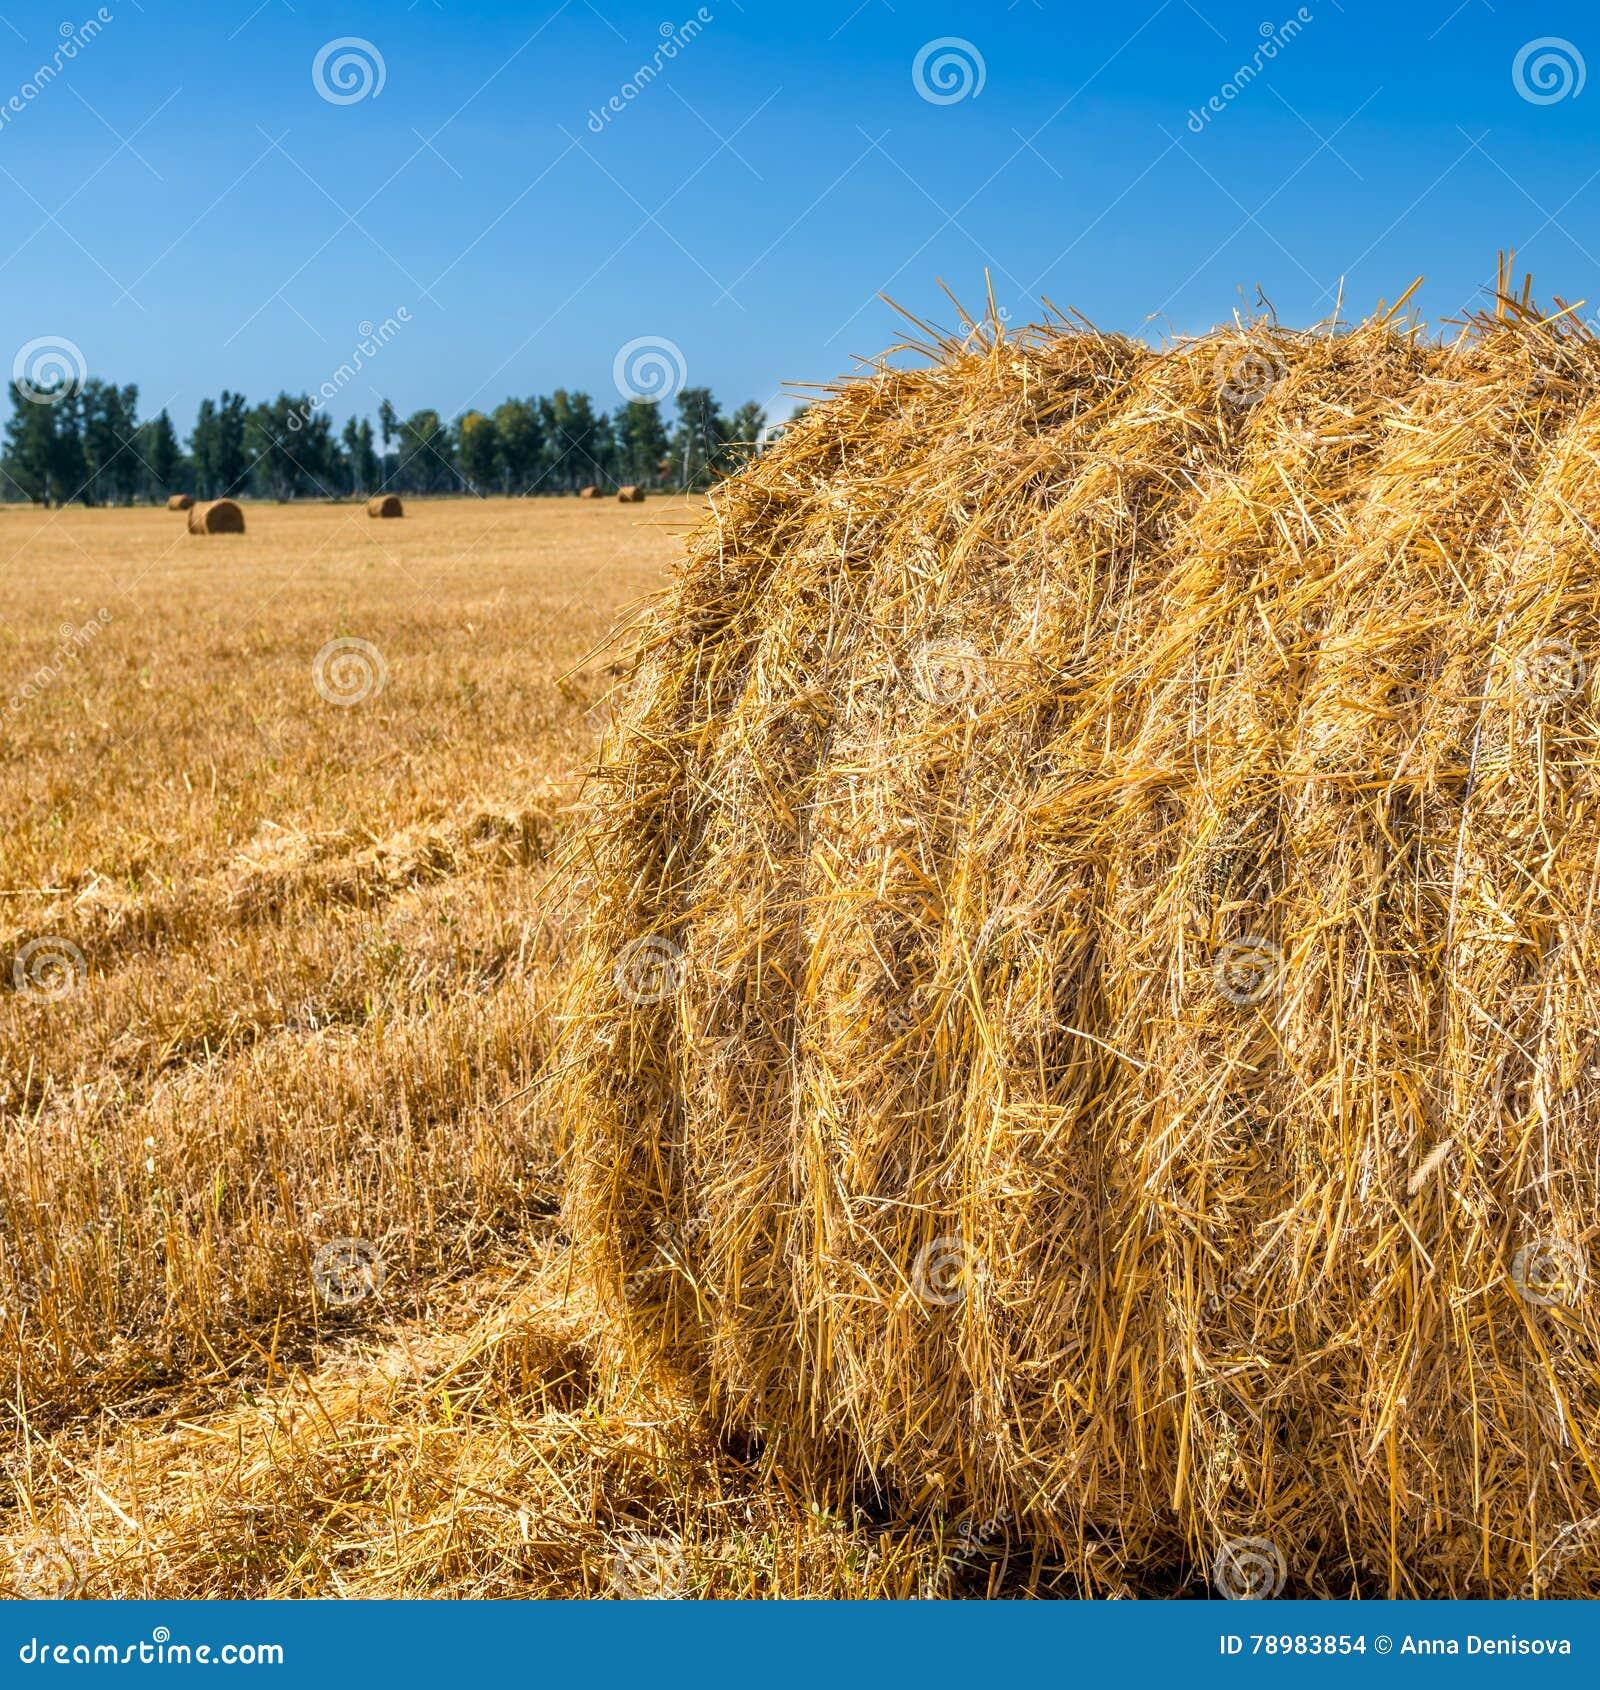 Large Piles of Hay Bales